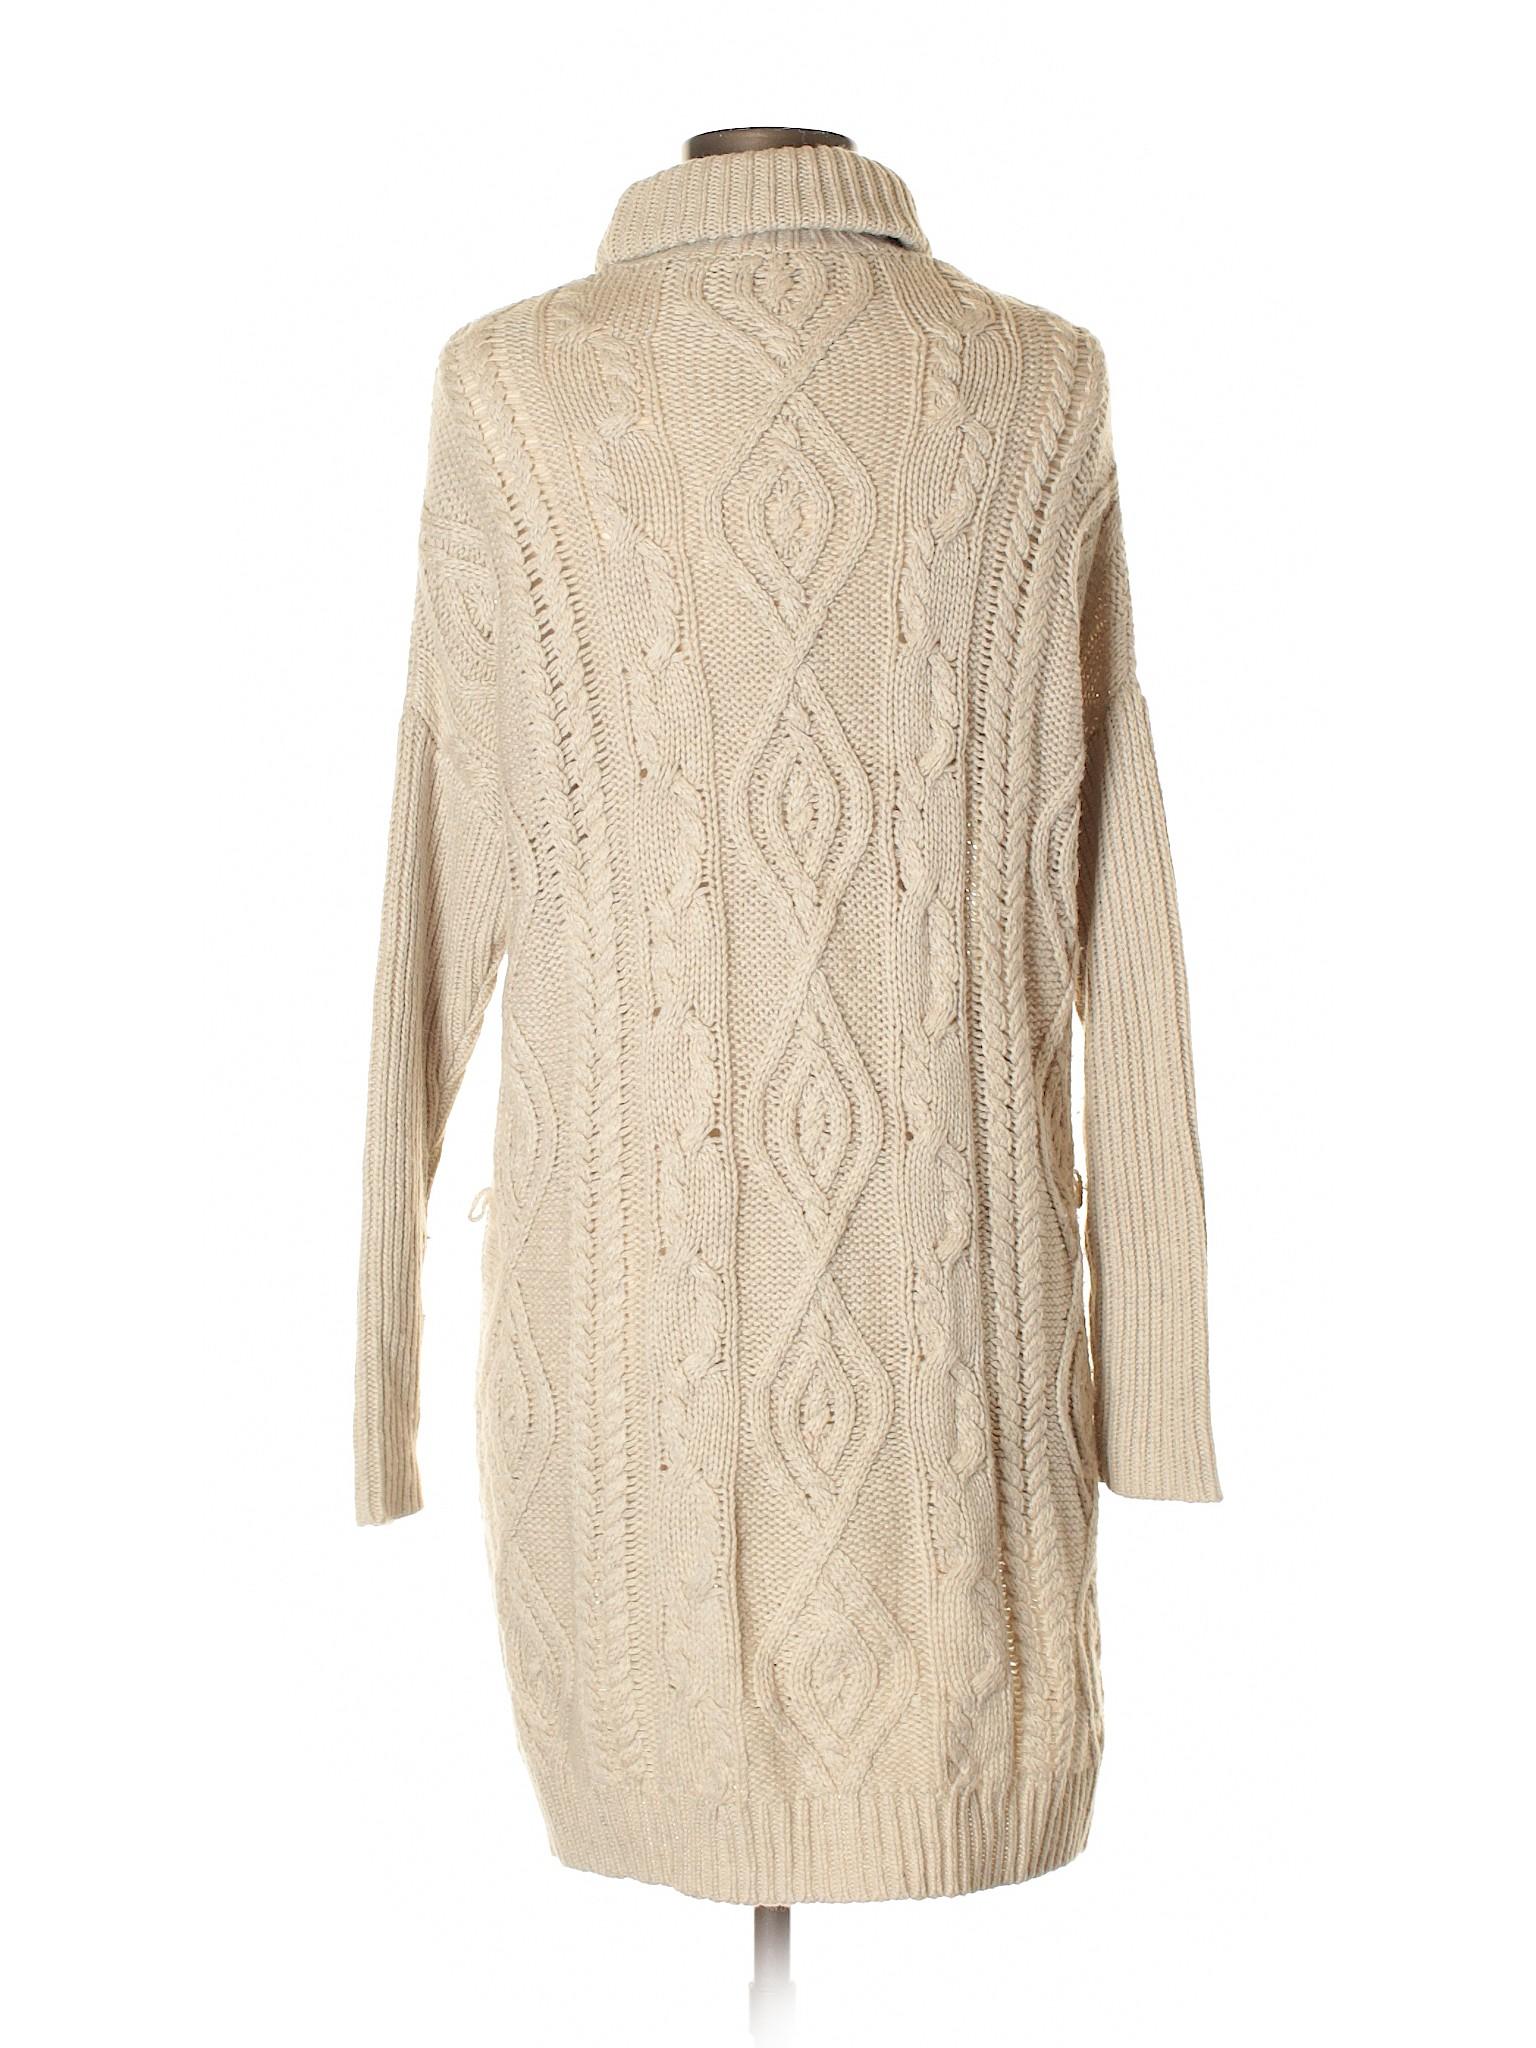 Moda Boutique International Casual winter Dress qSS5vr